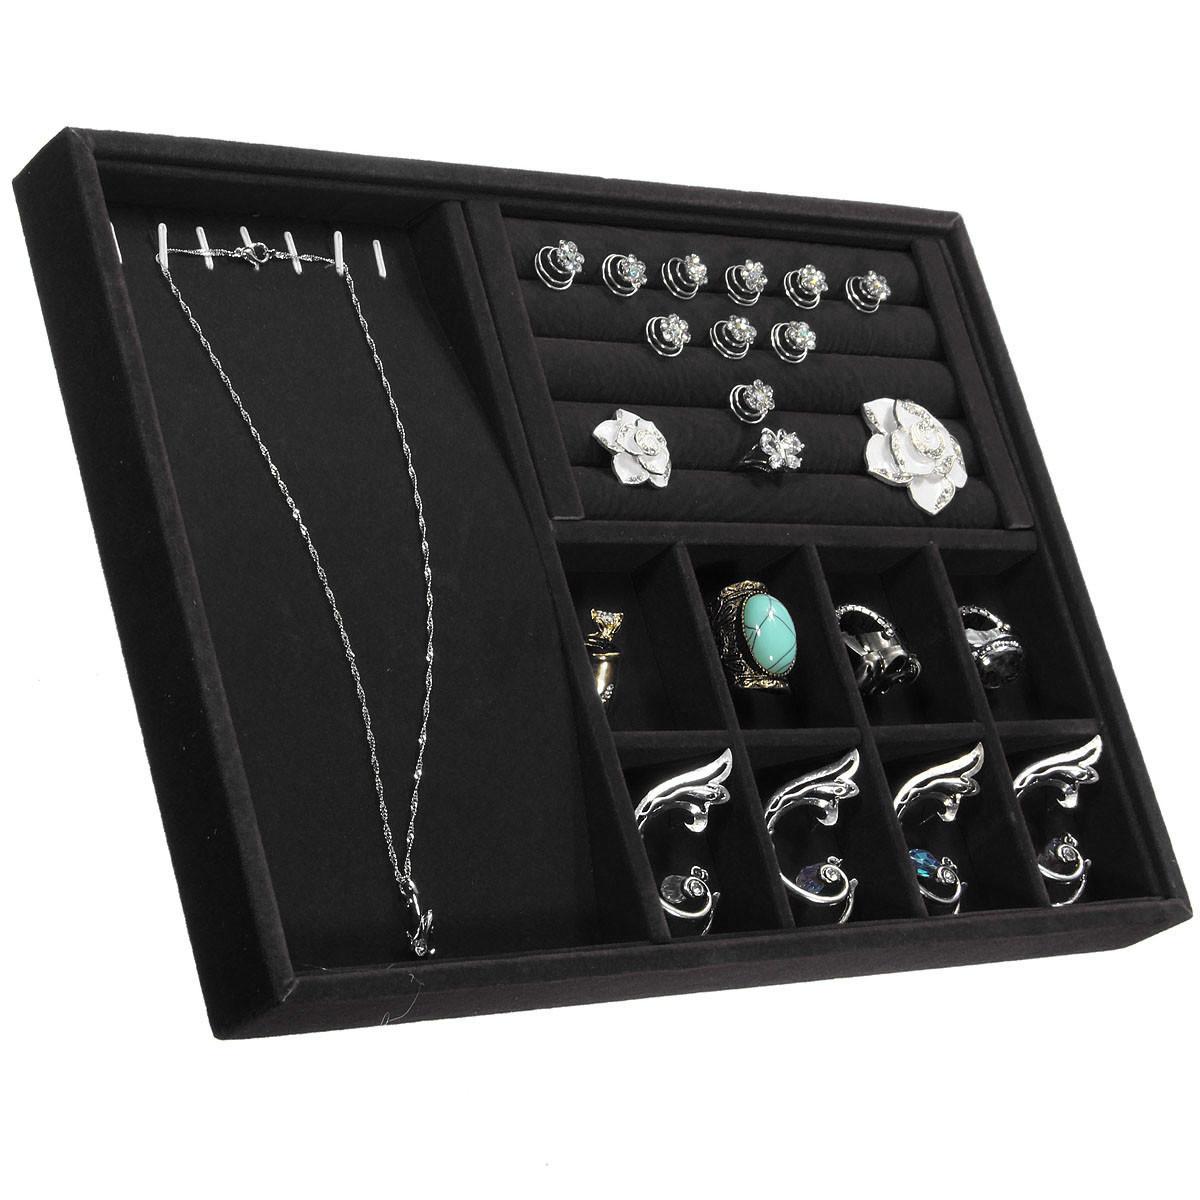 Velvet ring necklace jewelry display holder storage tray for Velvet jewelry organizer trays